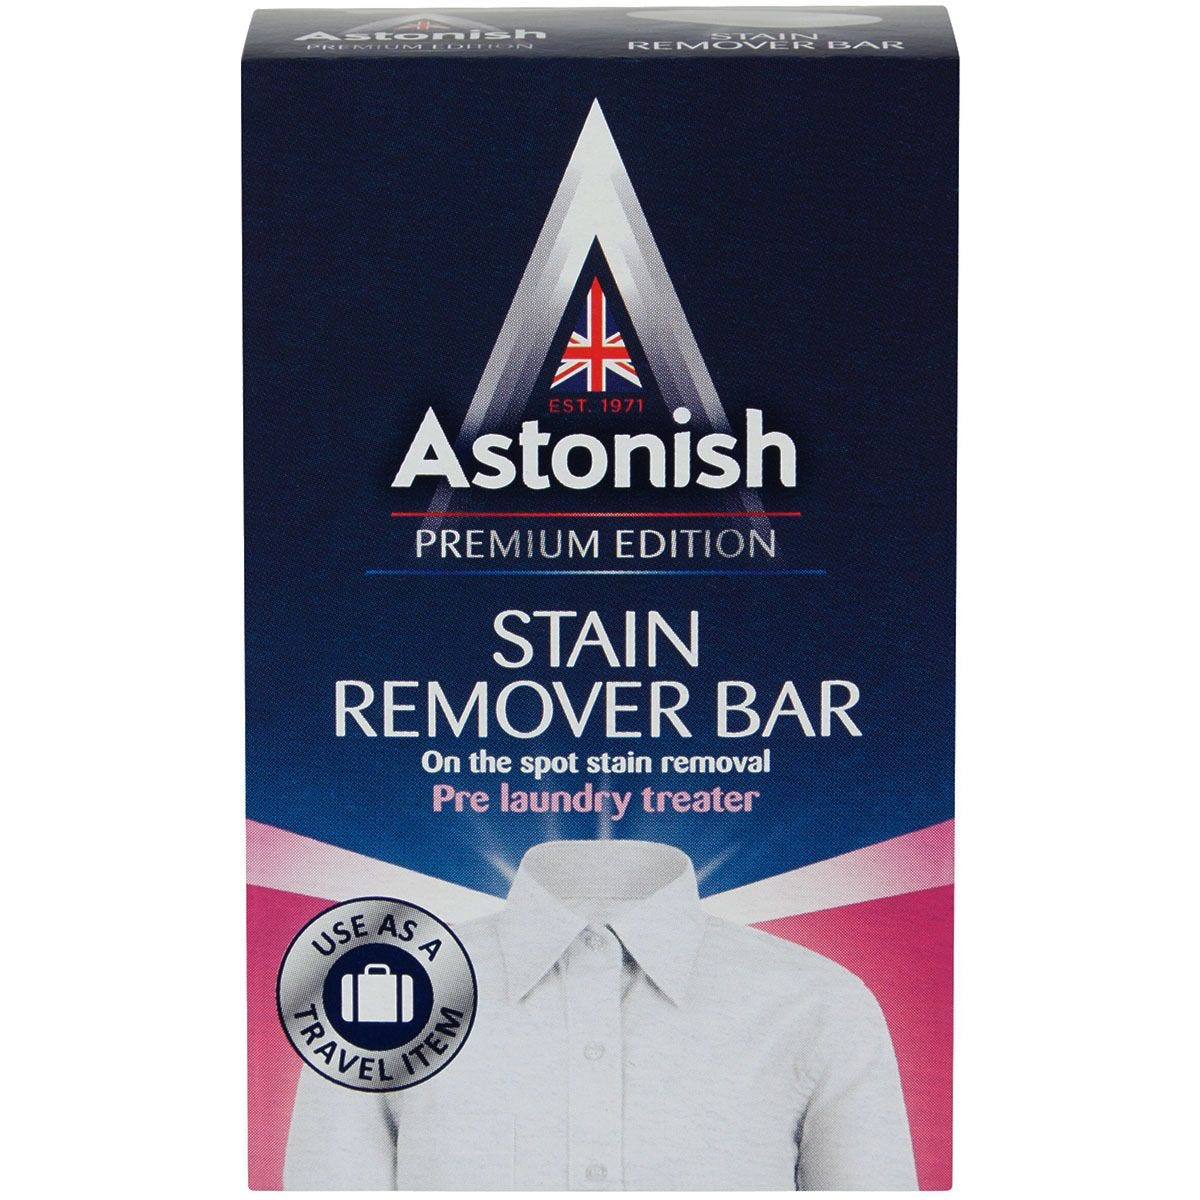 Astonish Premium Edition Stain Remover Bar